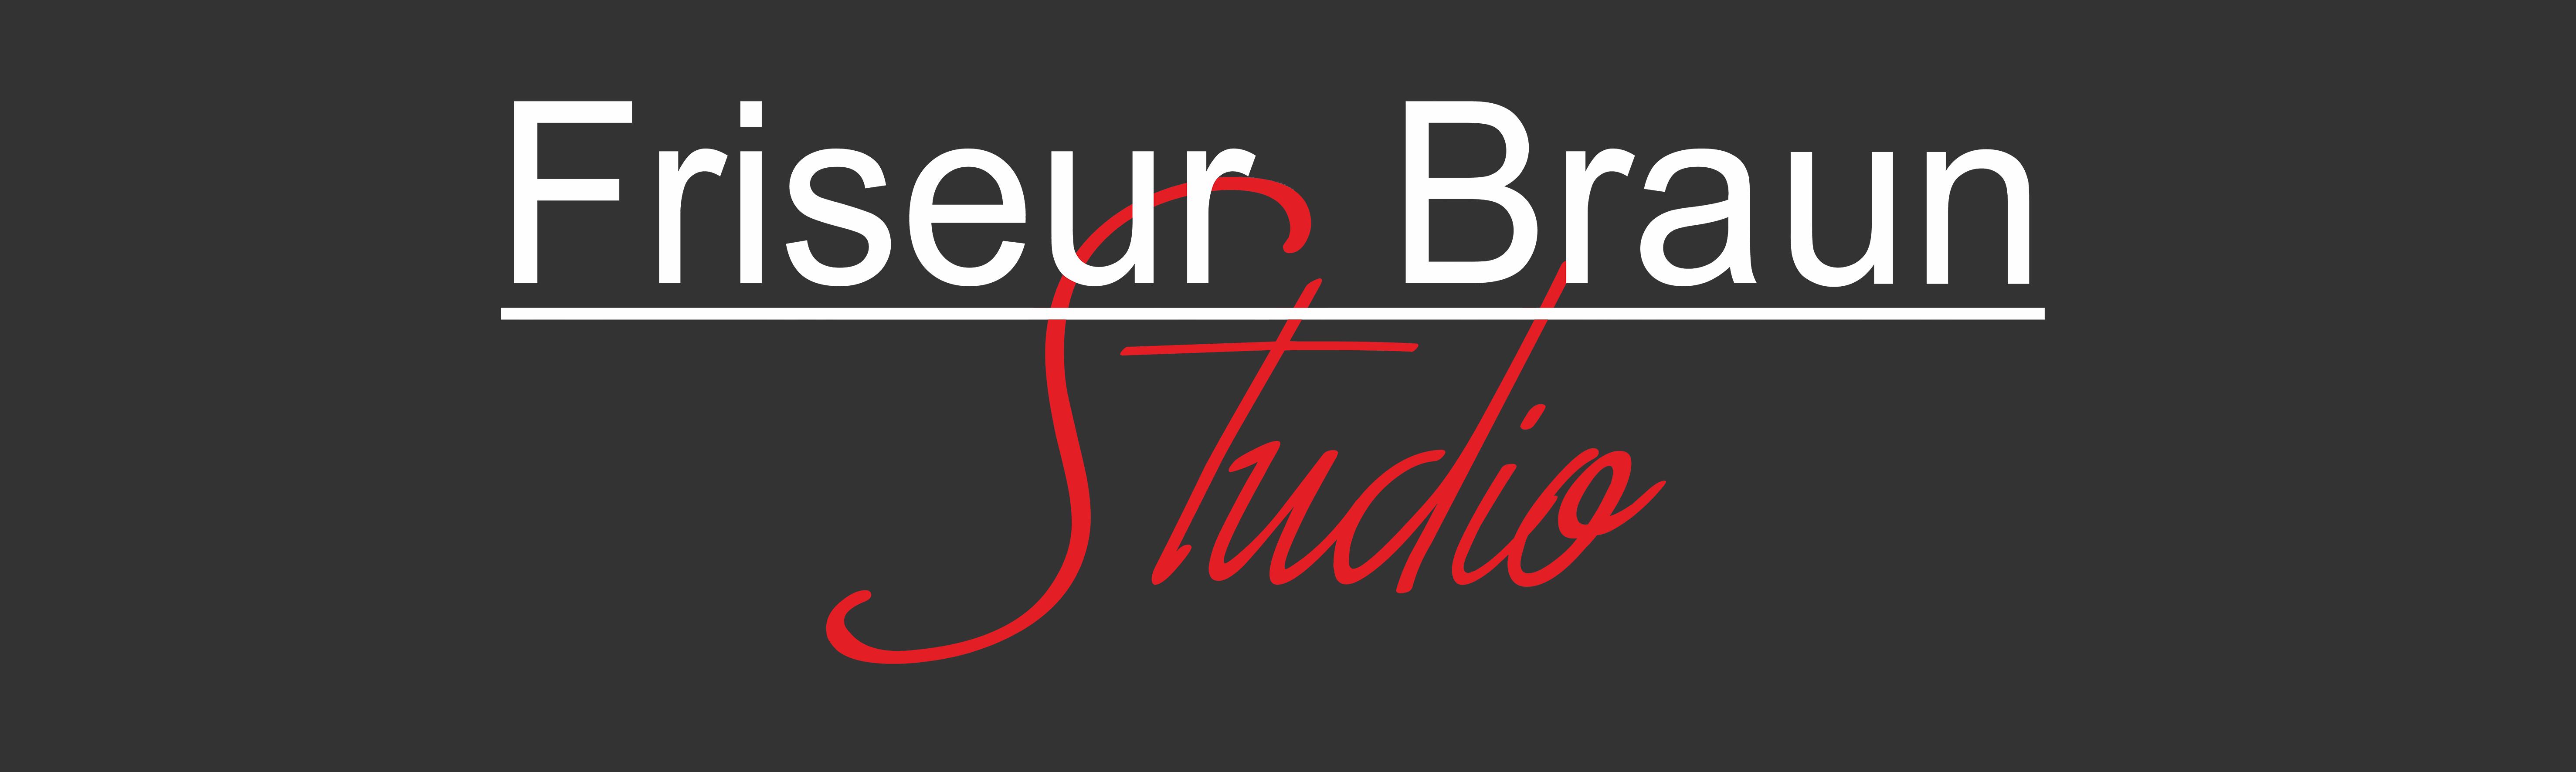 Friseur Studio Braun